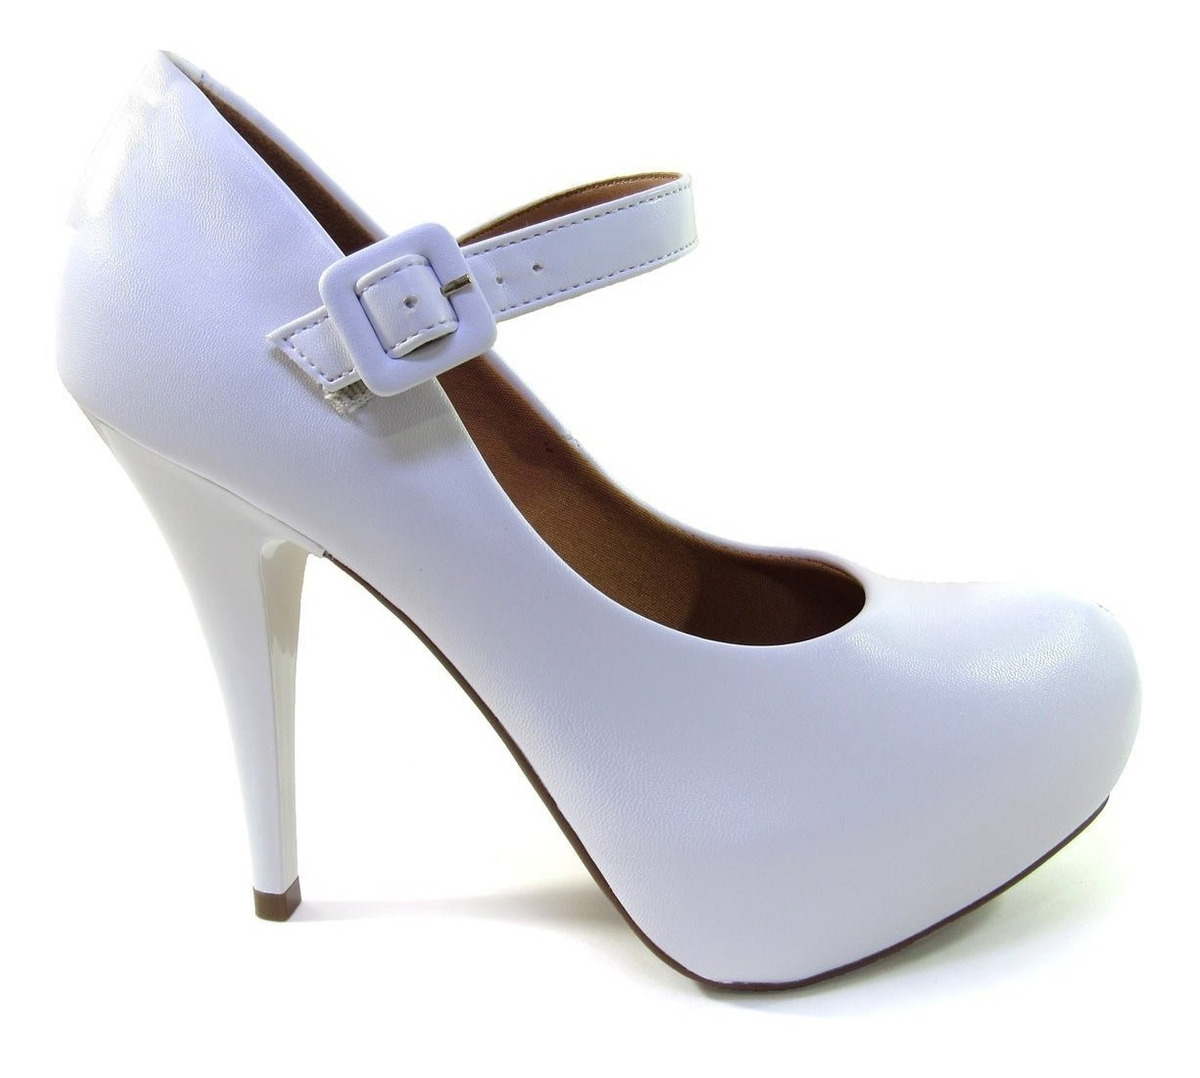 81d69ebb6 sapato scarpin feminino vizzano meia pata 1143304 noiva. Carregando zoom.